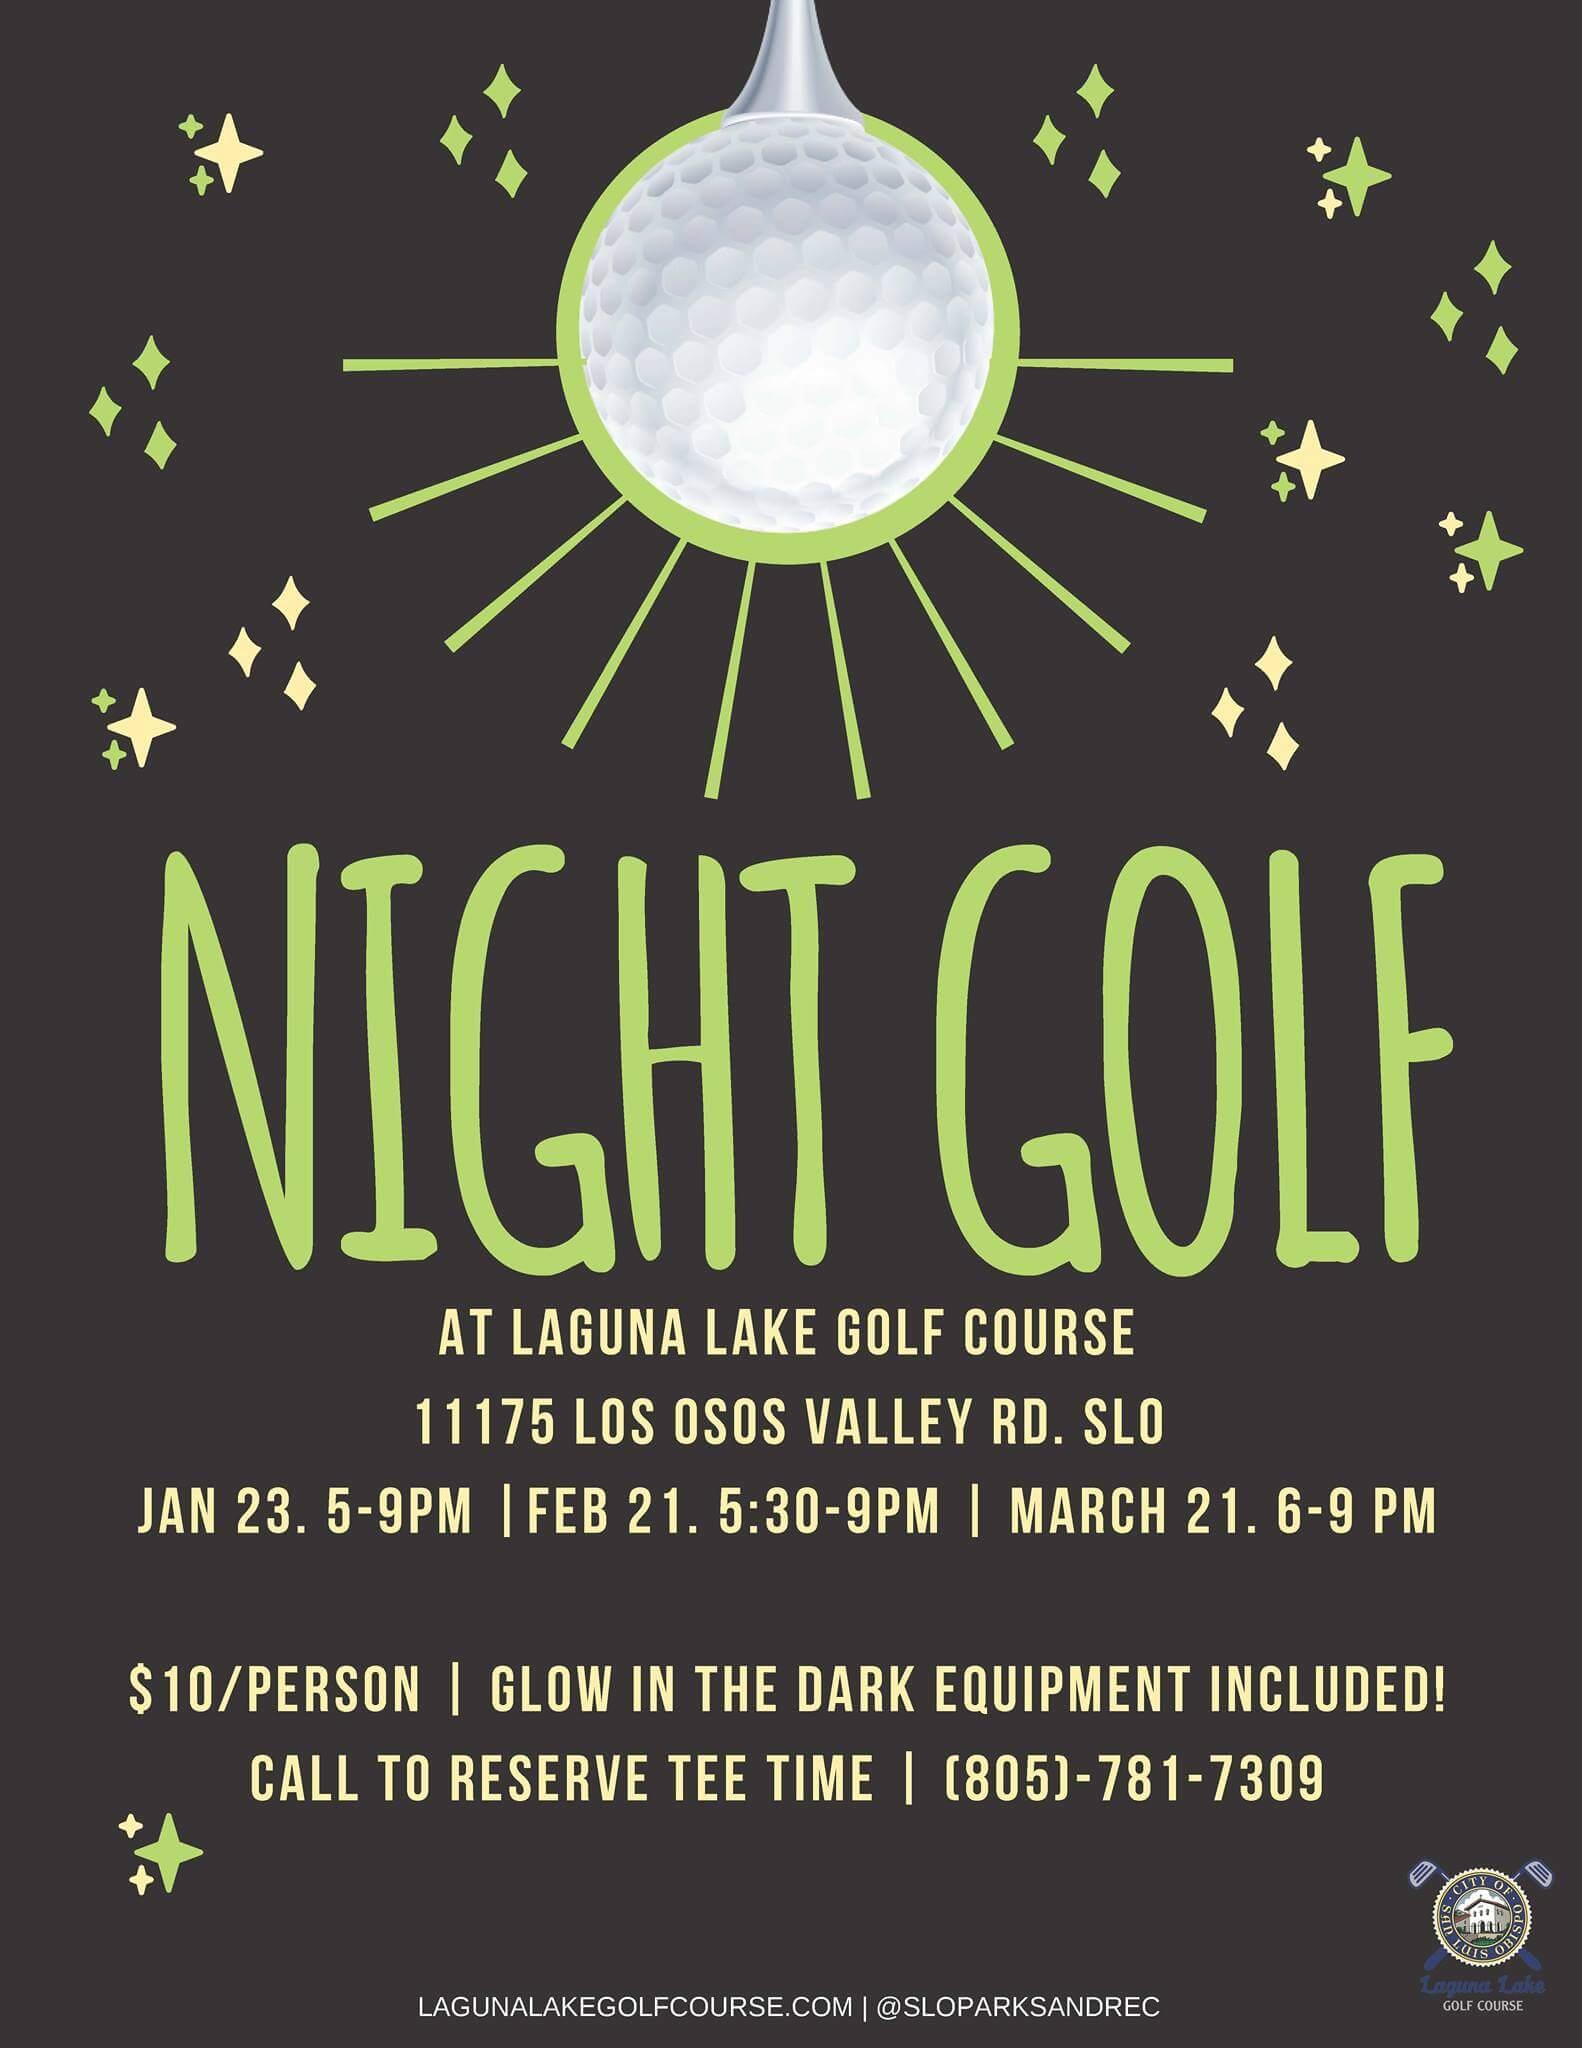 Night Golf at Laguna Lake Golf Course in San Luis Obispo Event Flyer